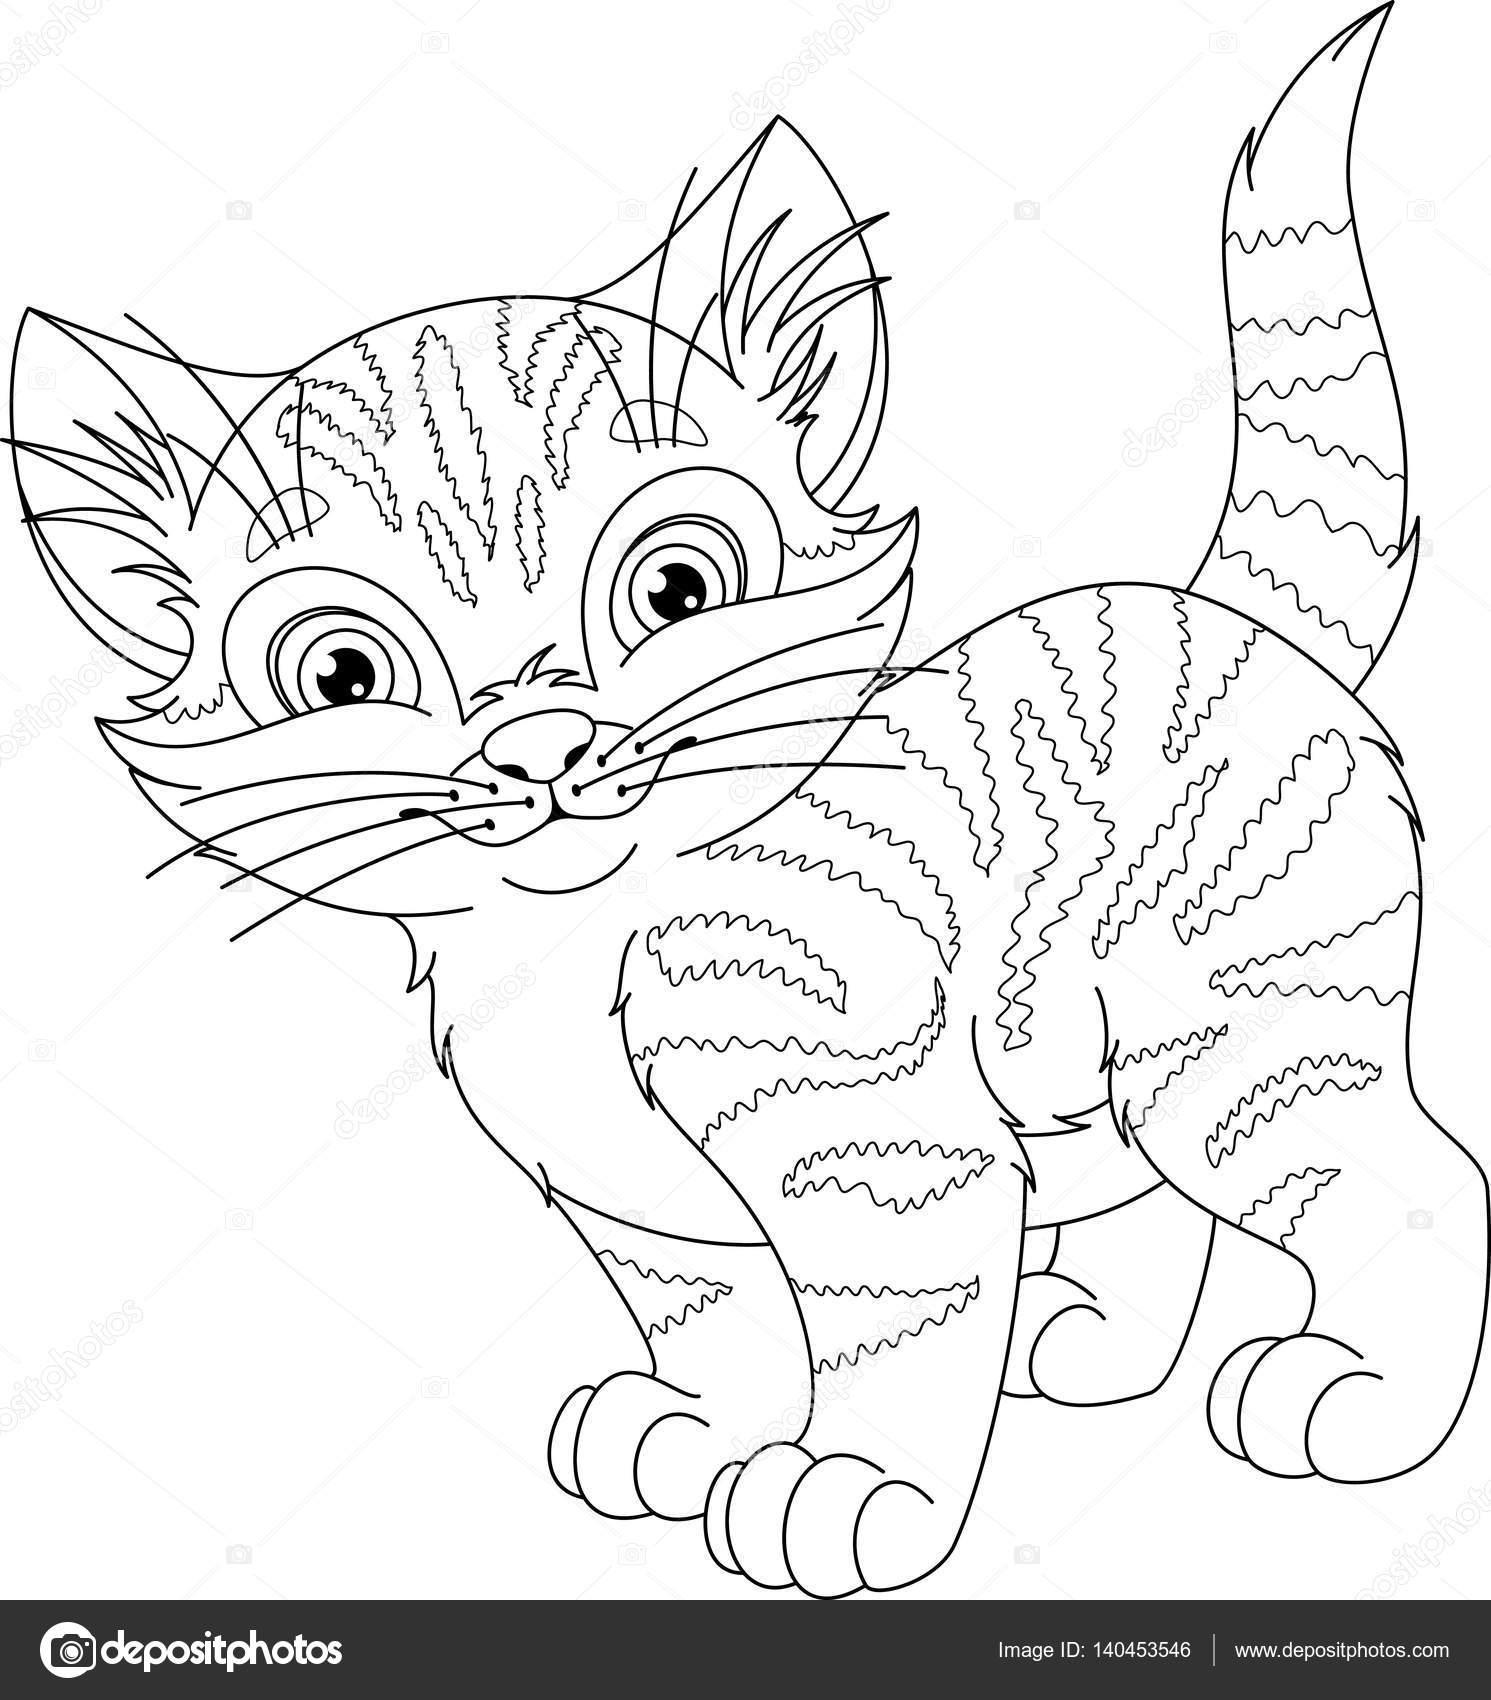 Kot Kolorowanki Grafika Wektorowa Malyaka 140453546